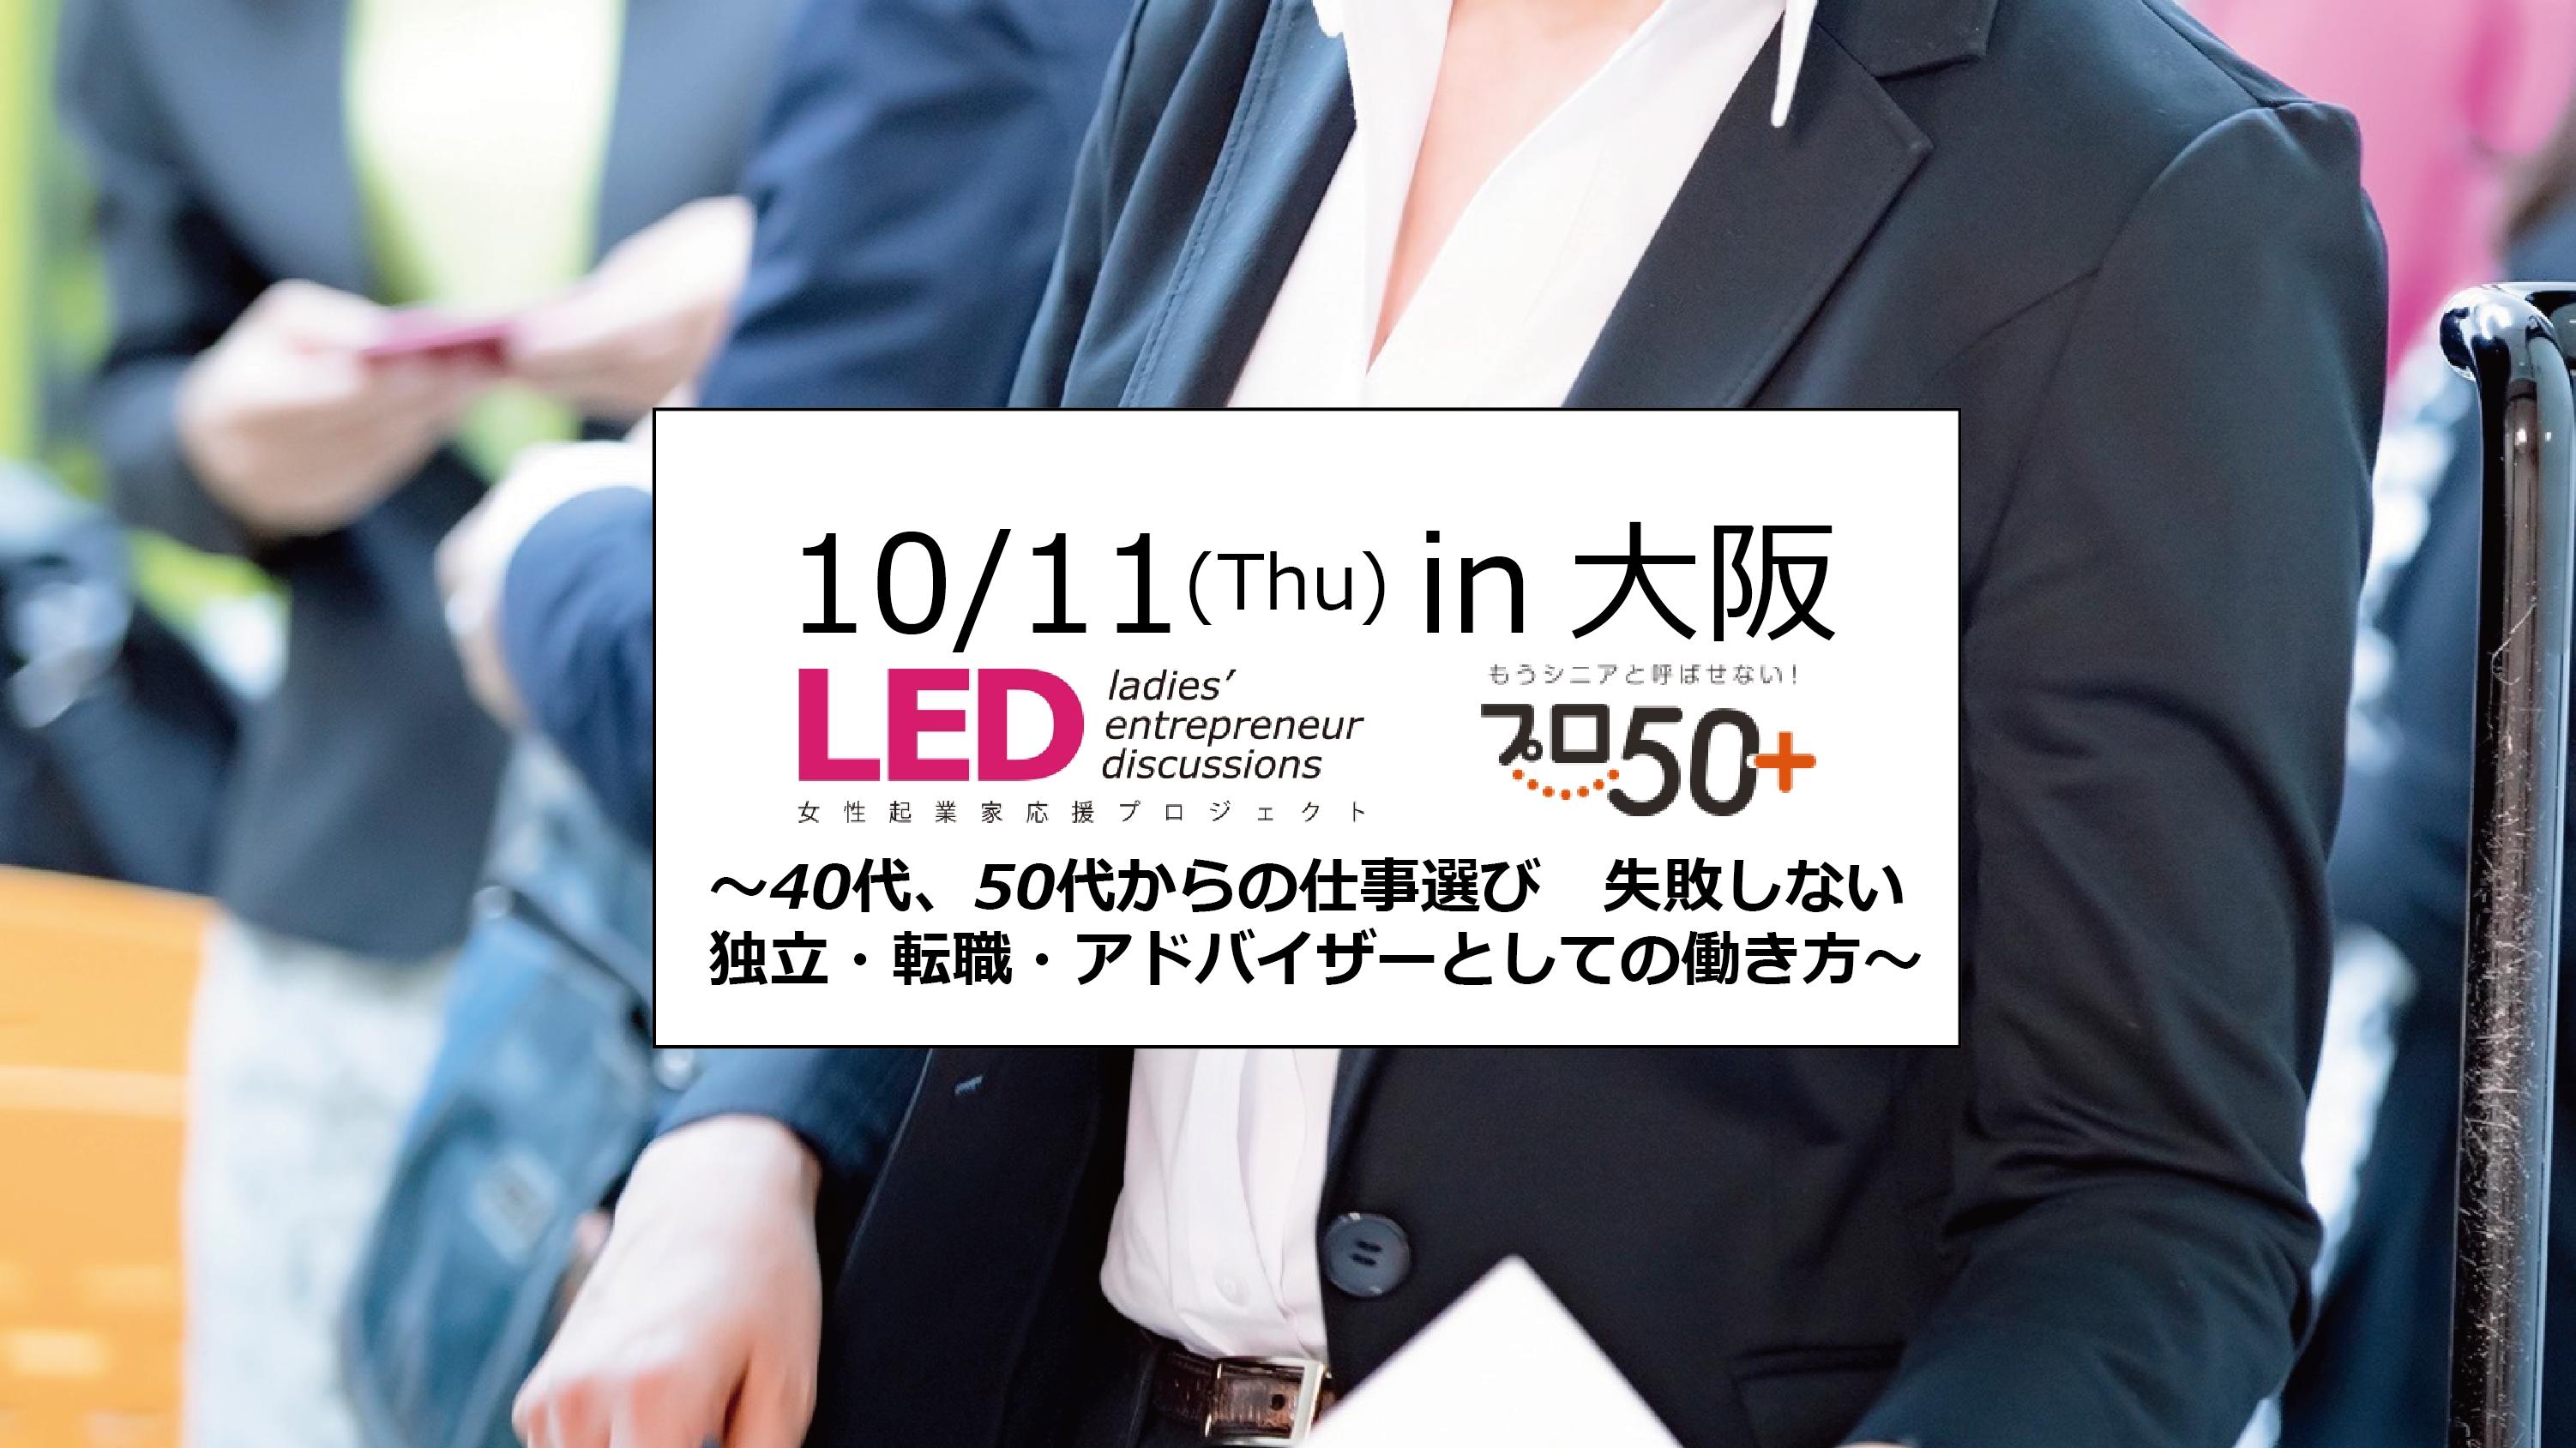 LED関西×プロ50+ 女性向け仕事選びで失敗しない独立セミナー